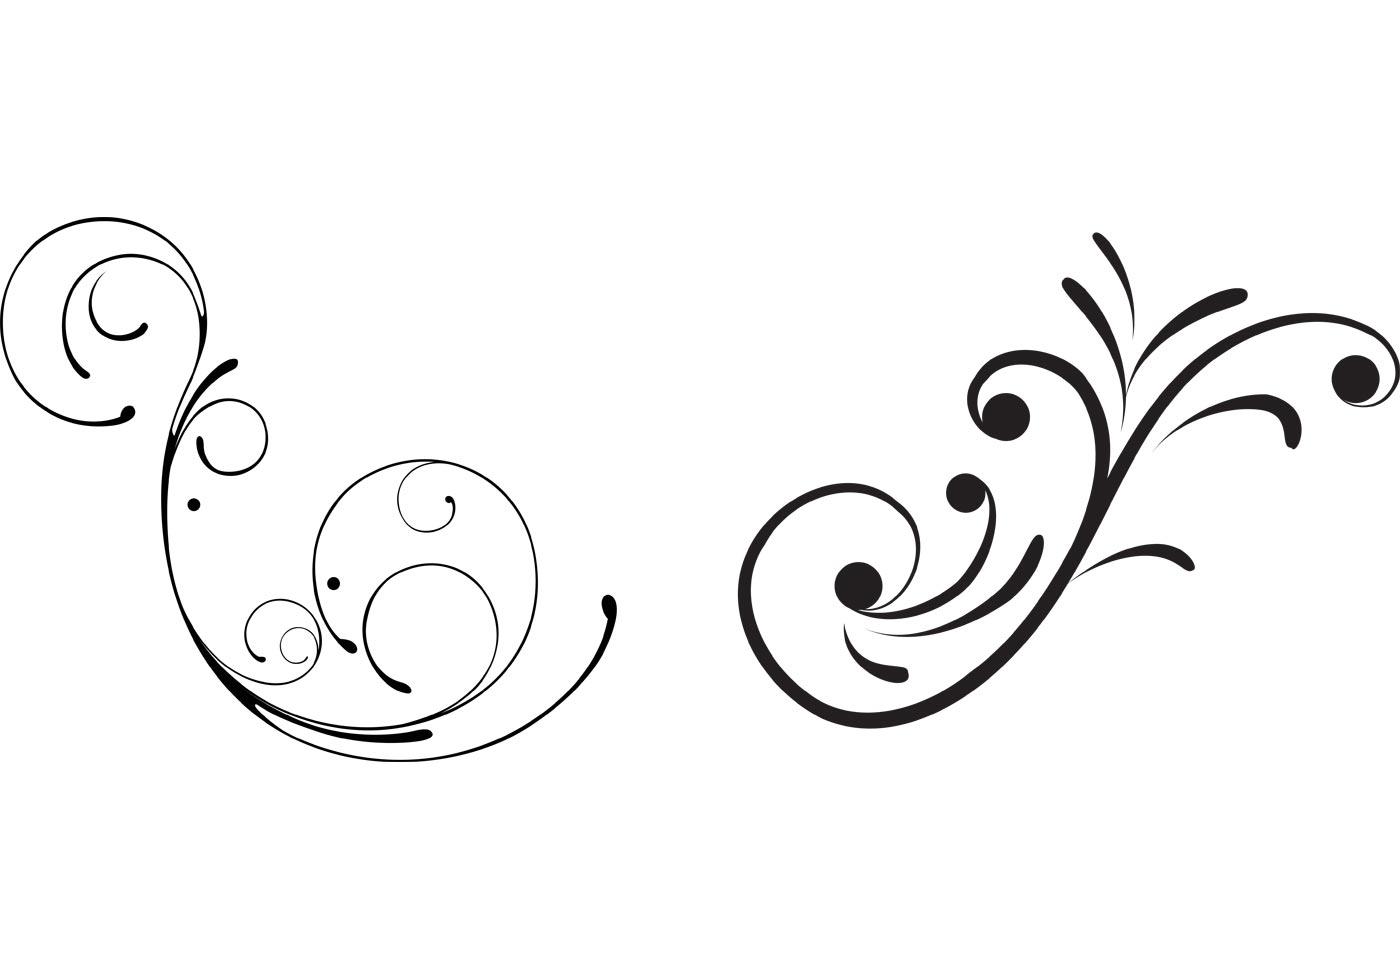 Free Swirly Floral Scrolls Vectors